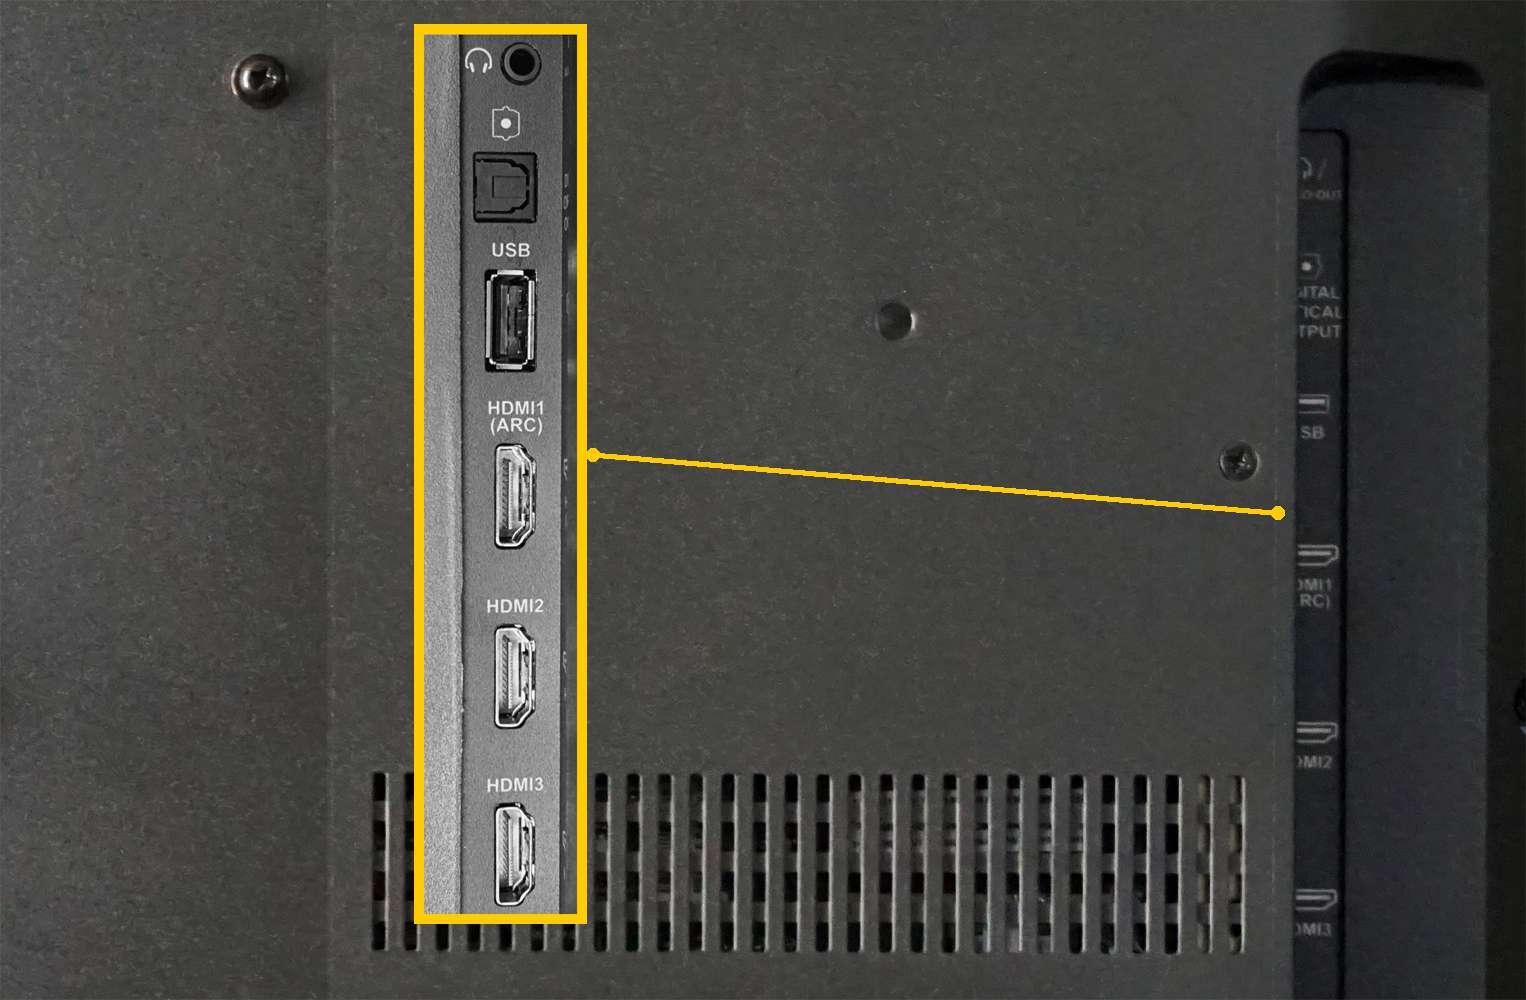 TV Connections – HDMI, USB, Digital Optical, Earphone